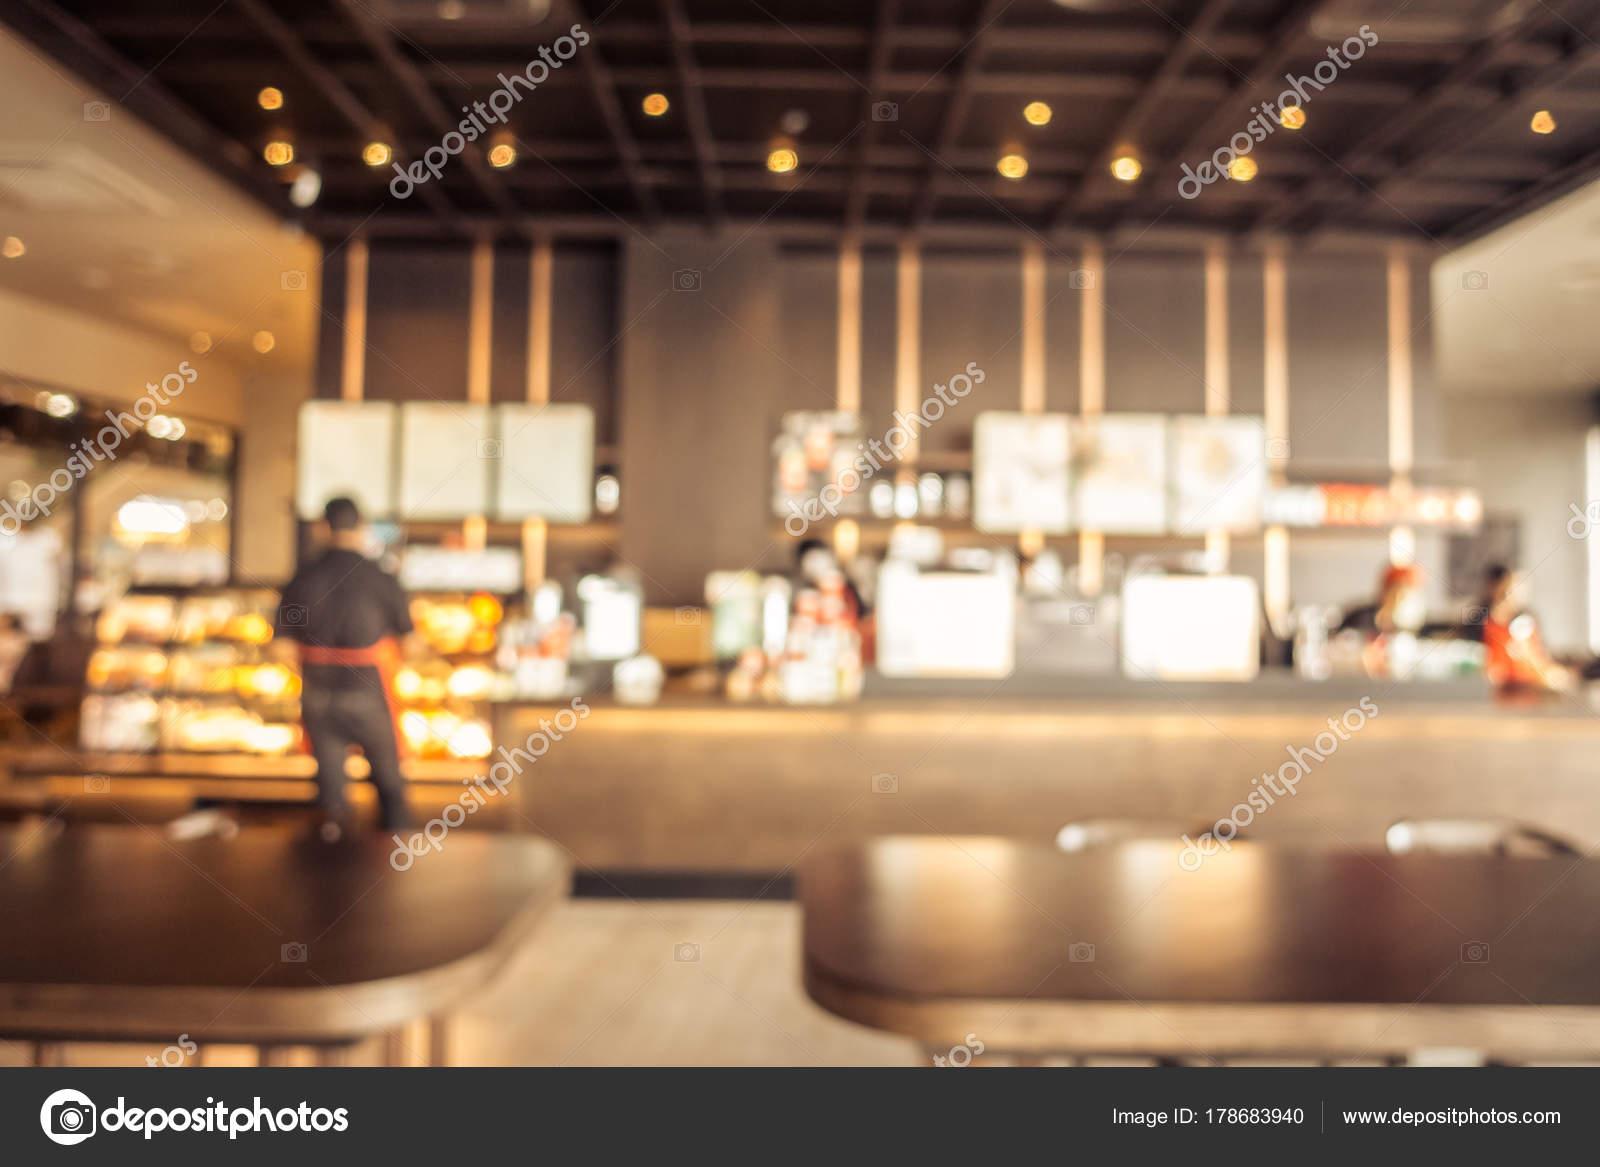 Abstract Blur Coffee Shop Cafe Restaurant Interior Background Vintage Filter Stock Photo C Mrsiraphol 178683940